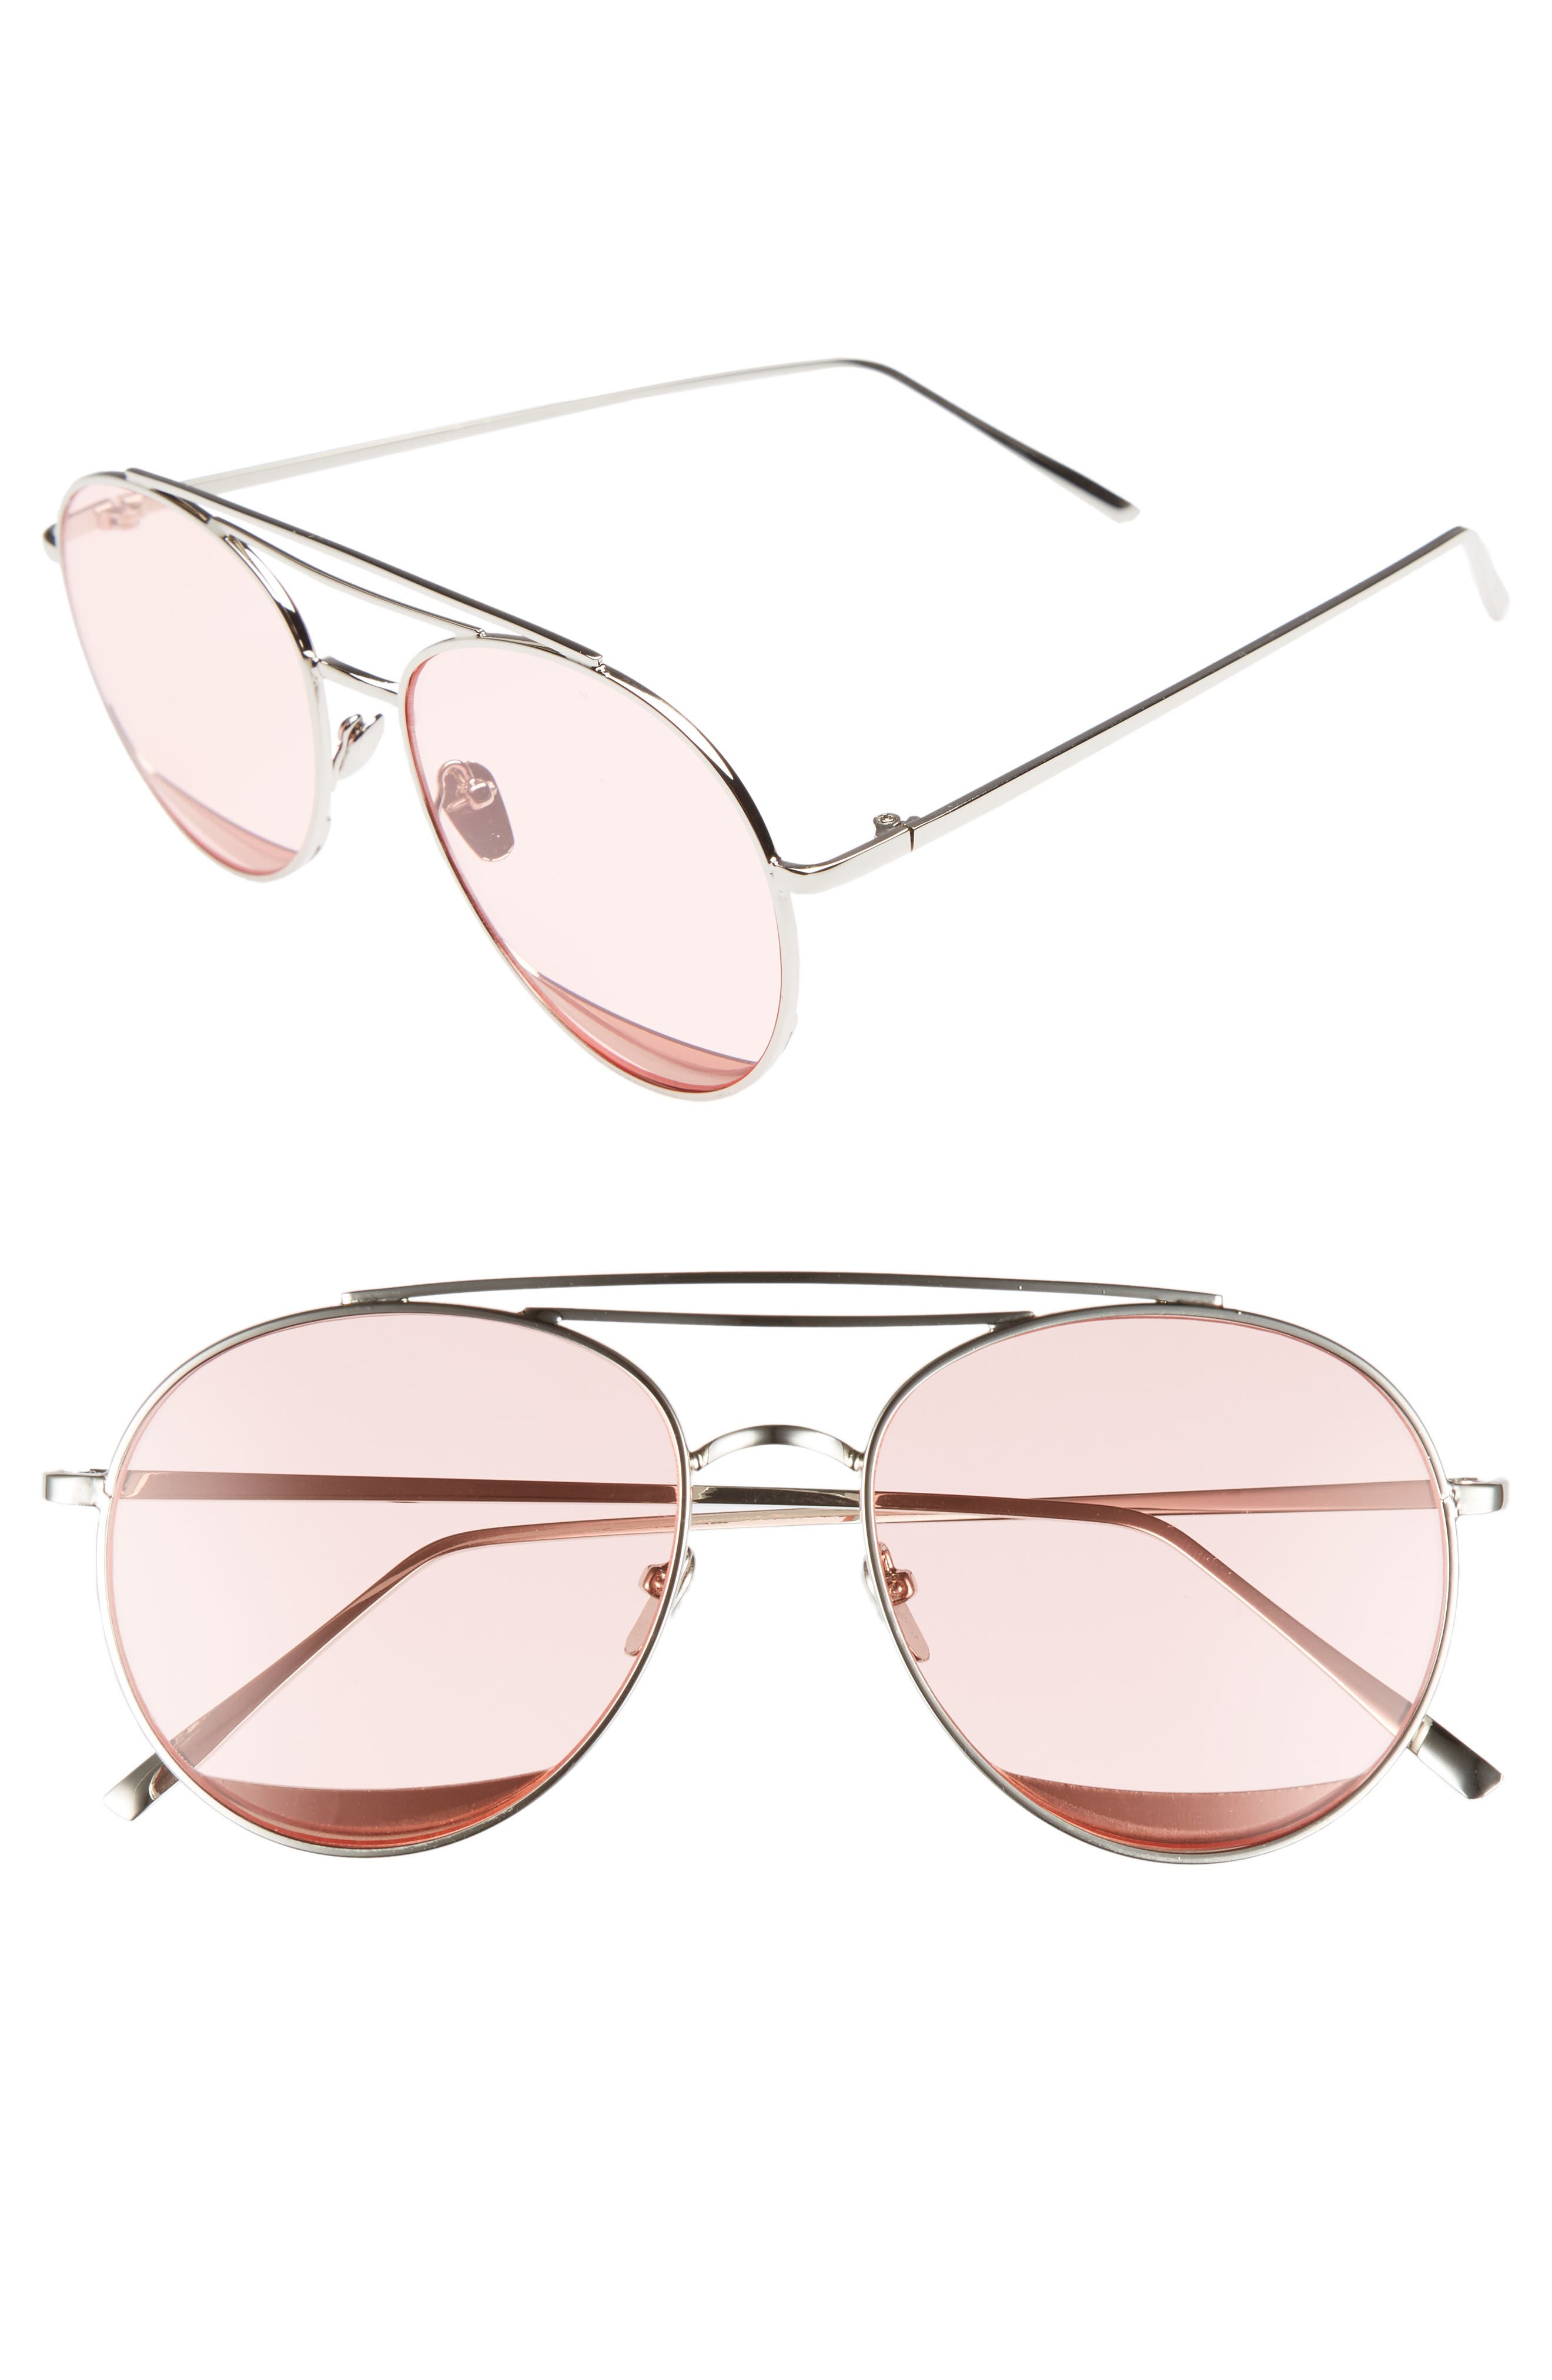 Main Image - Shady Lady The Maddox 62mm Rimless Aviator Sunglasses